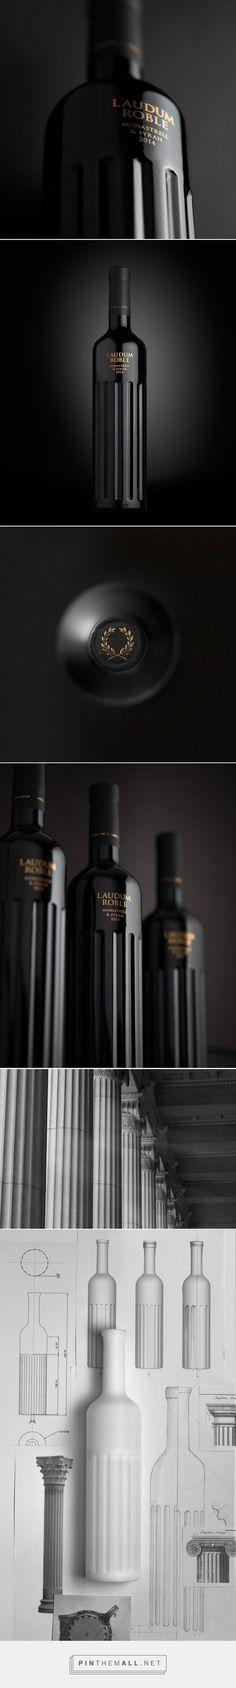 Laudum wine packaging design by Lavernia & Cienfuegos - http://www.packagingoftheworld.com/2017/06/laudum.html - created via https://pinthemall.net